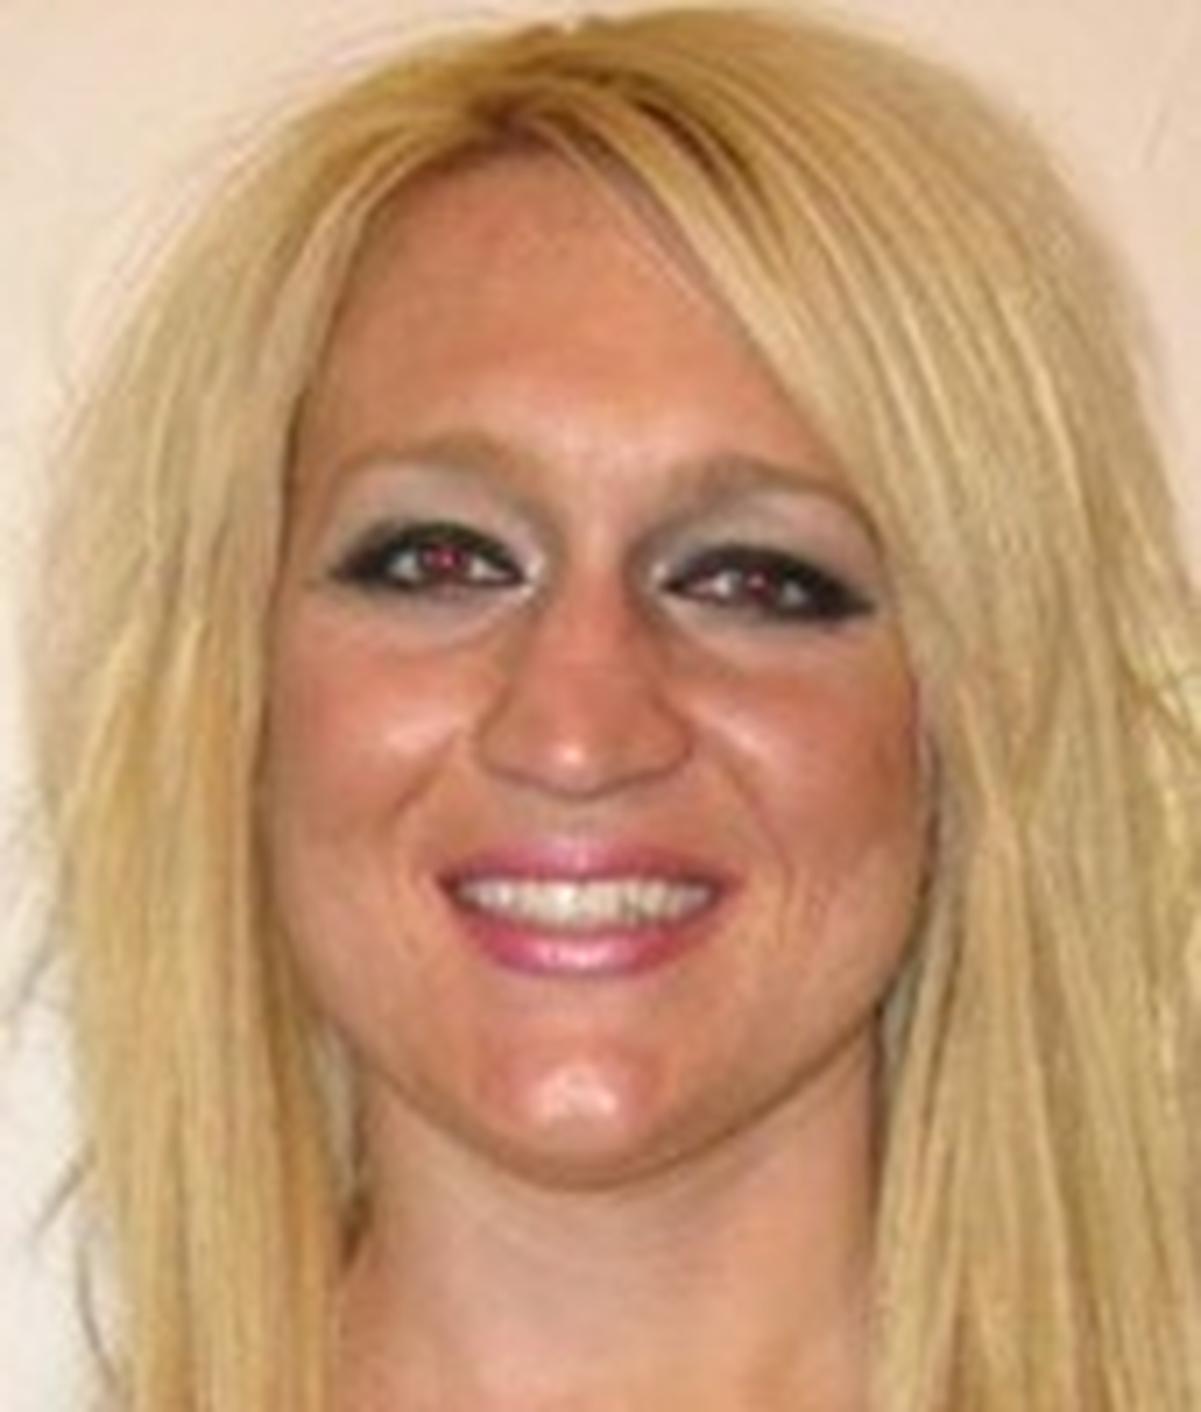 Leah Lovecock